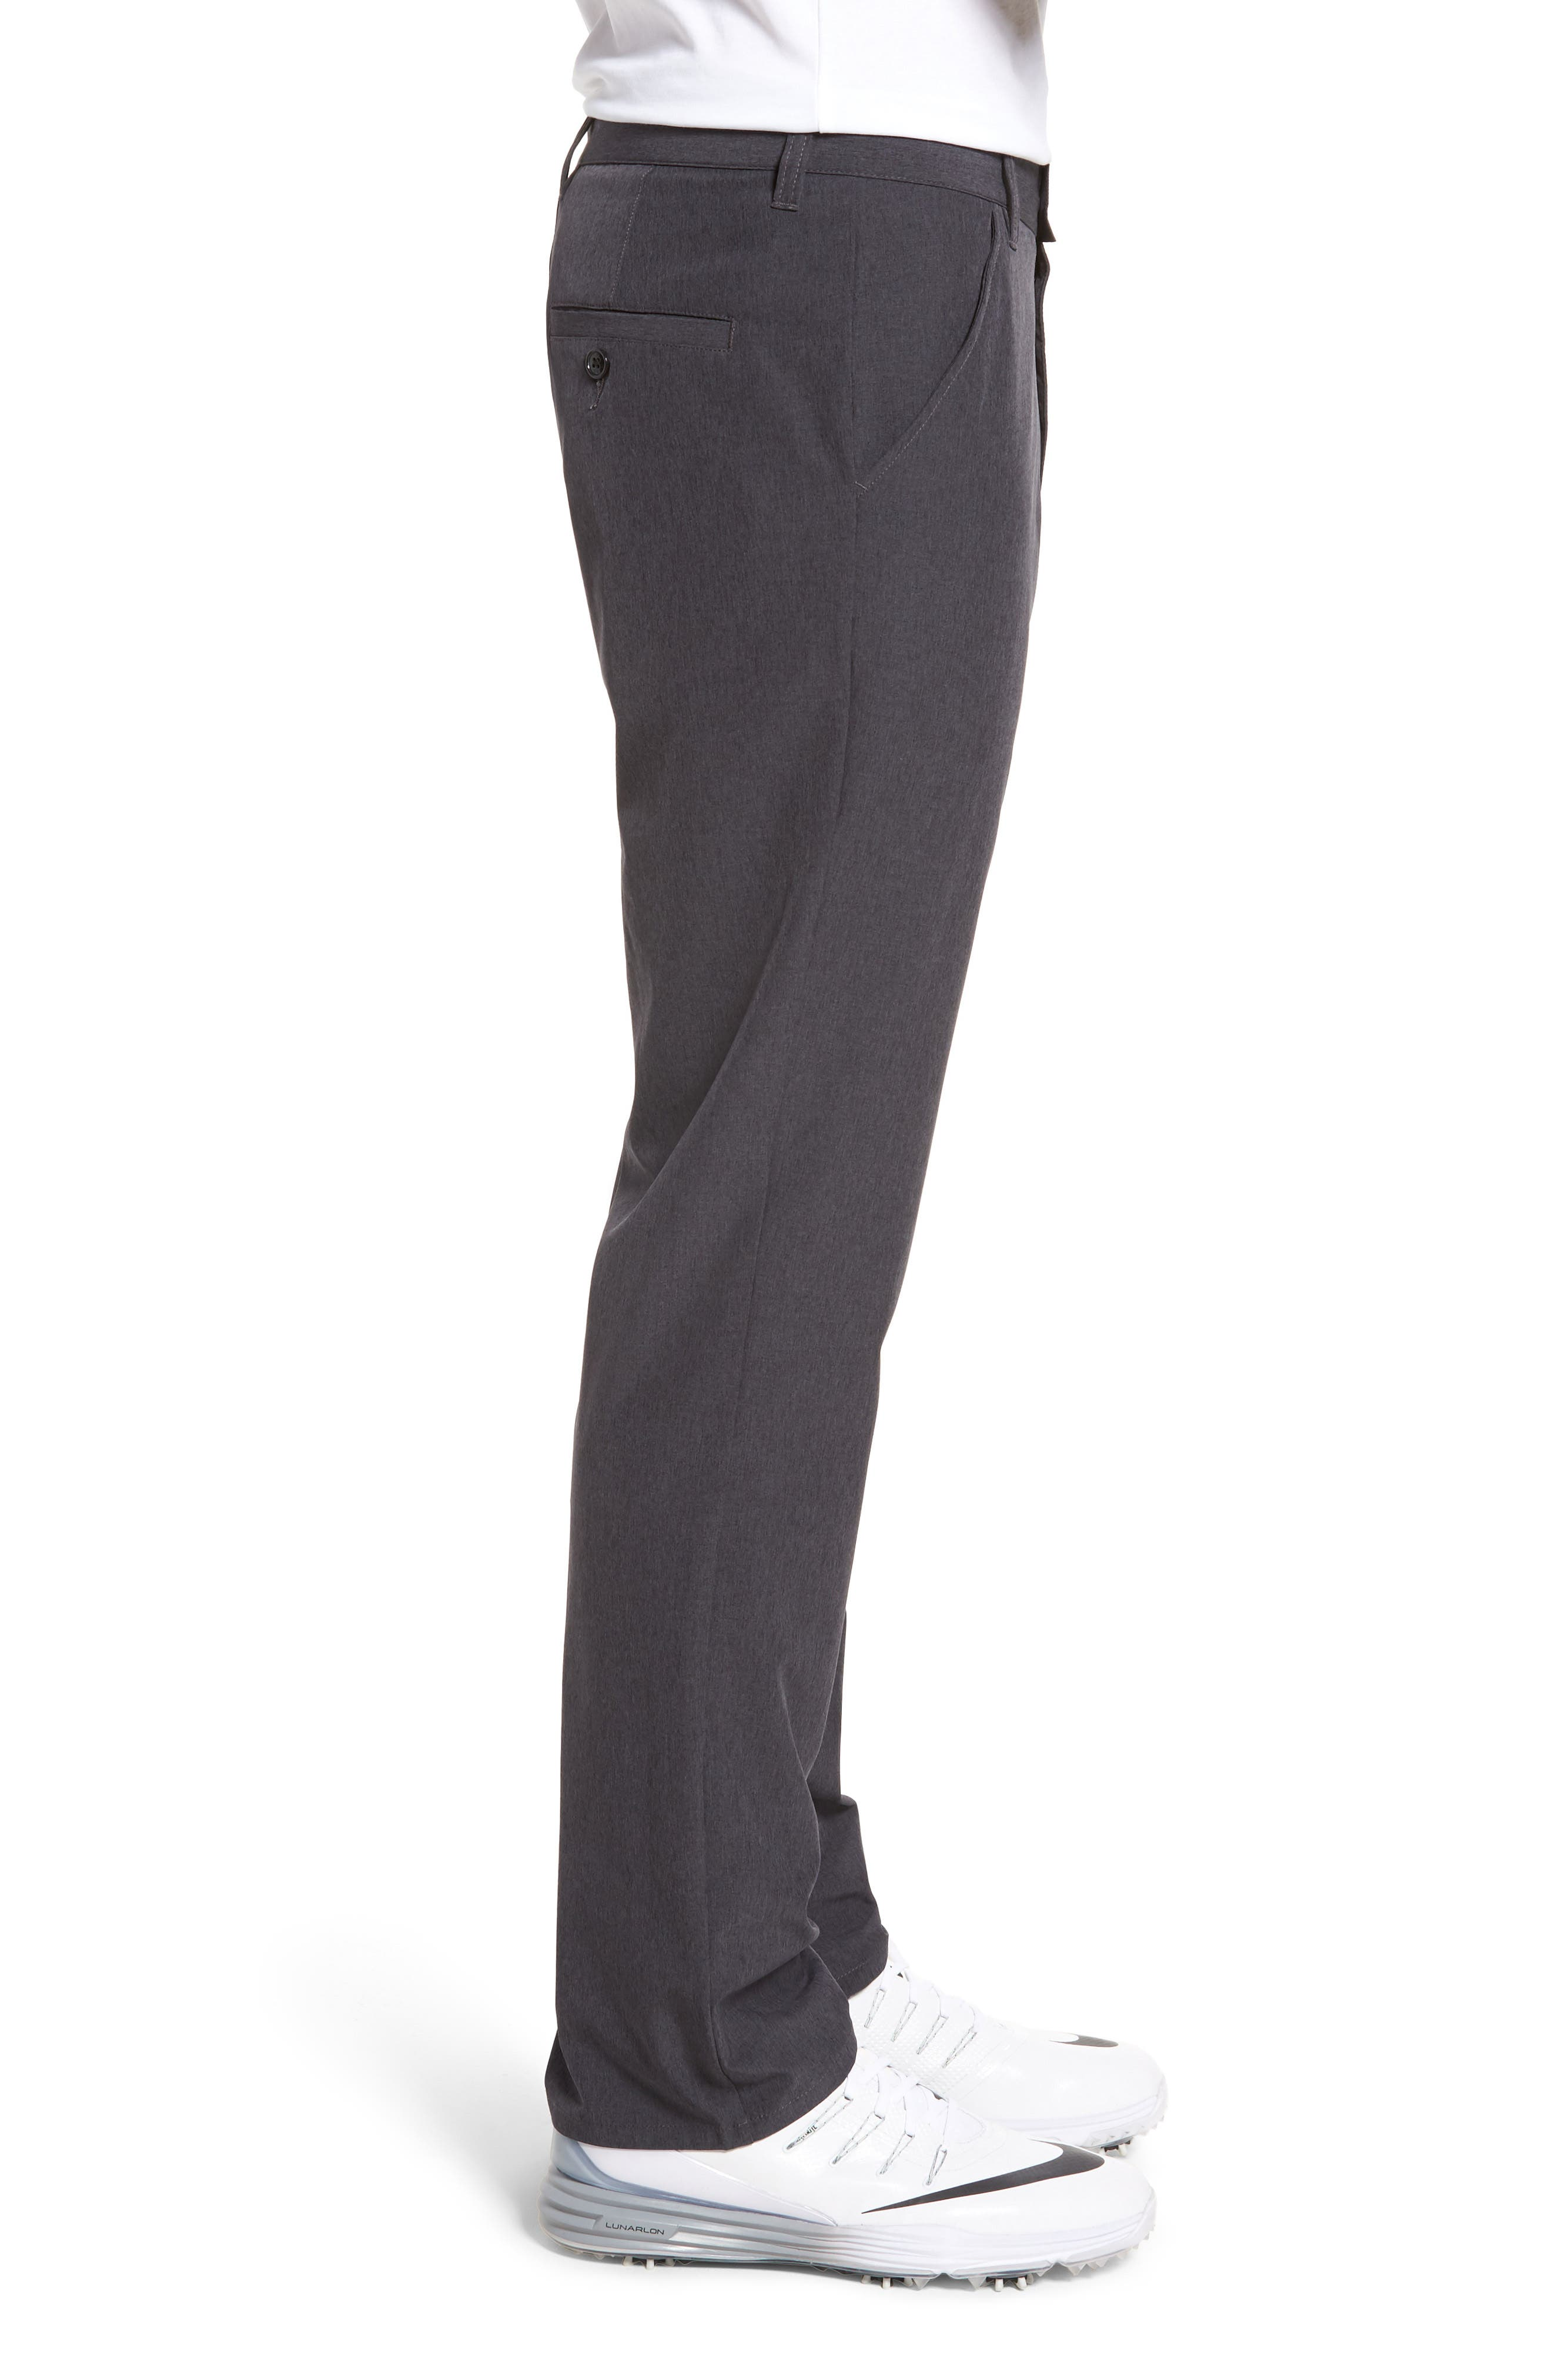 Pantladdium Pants,                             Alternate thumbnail 3, color,                             HEATHER BLACK